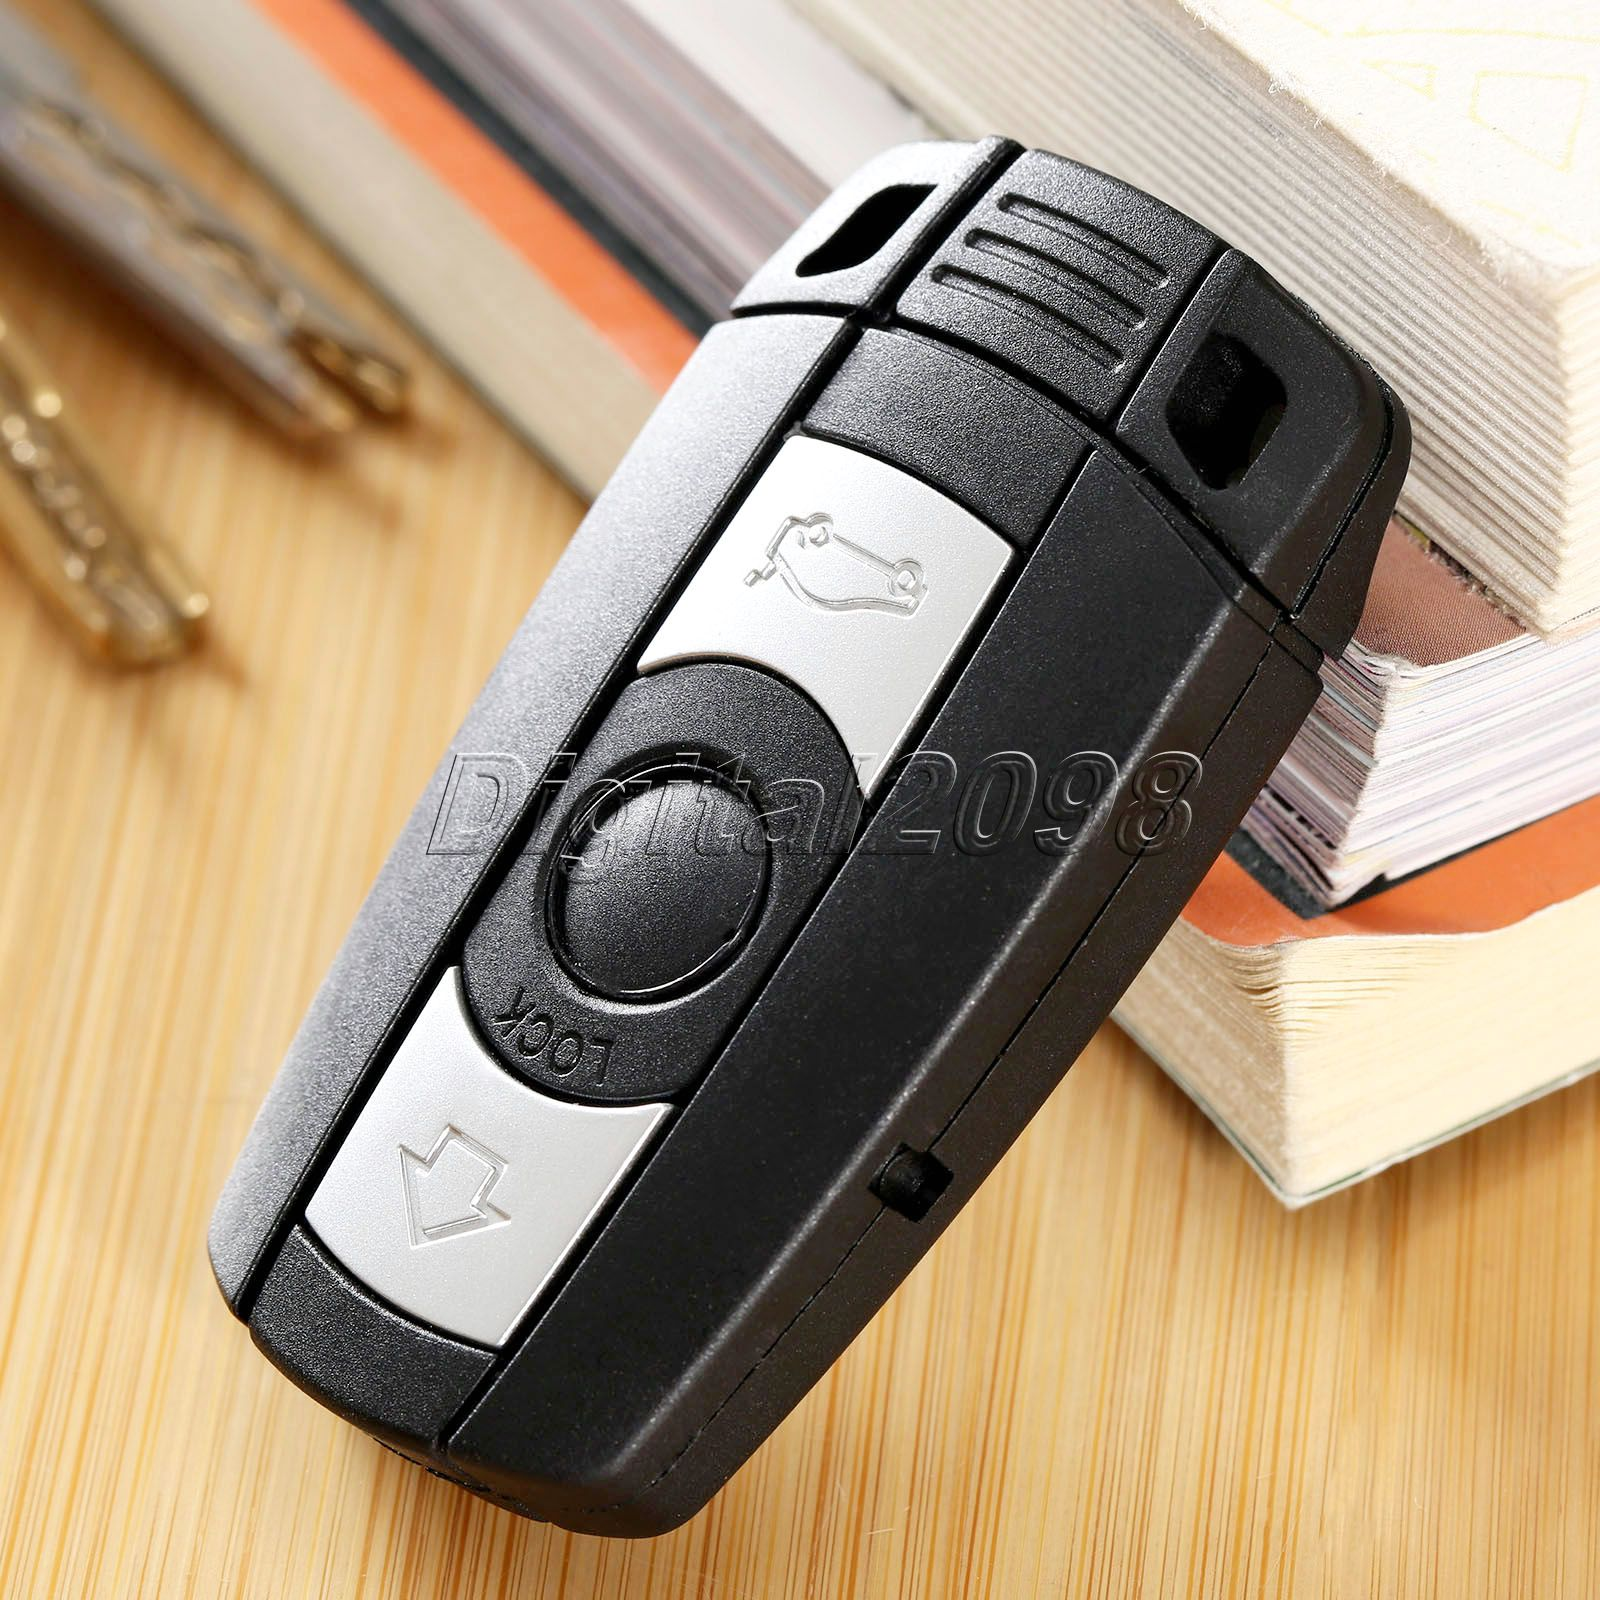 Blank Uncut Key fit for BMW 1 3 5 6 Series Remote Key Case Fob Smart Key